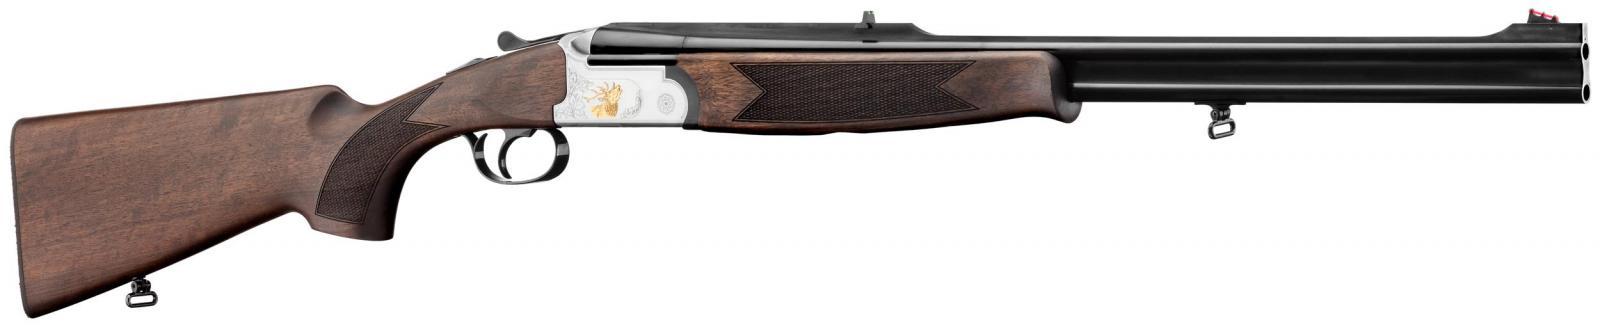 Carabine RENATO BALDI EXPRESS PREMIER Acier Cal 8x57JRS